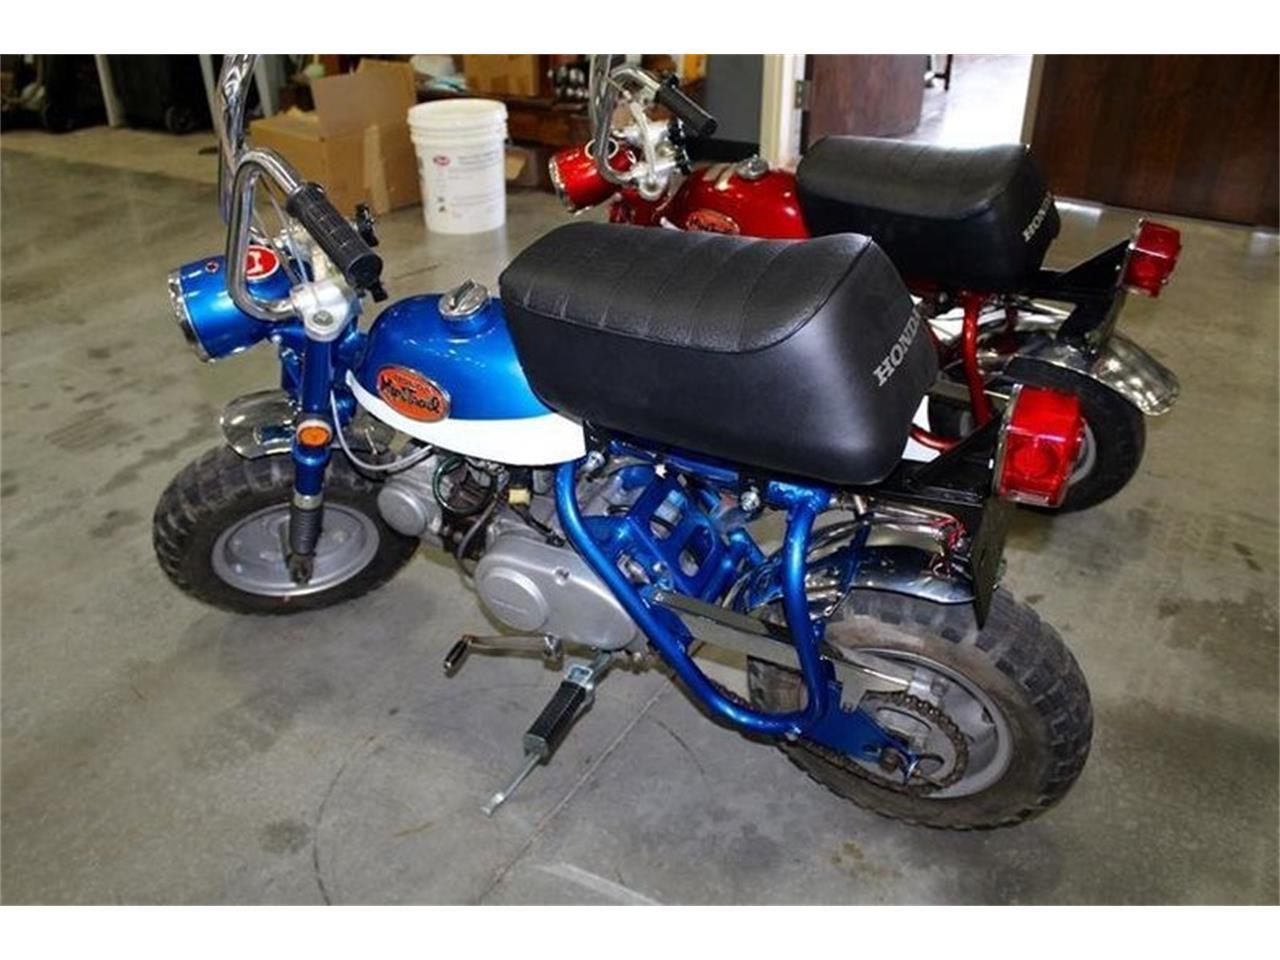 1971 Honda Motorcycle (CC-1165483) for sale in Sarasota, Florida